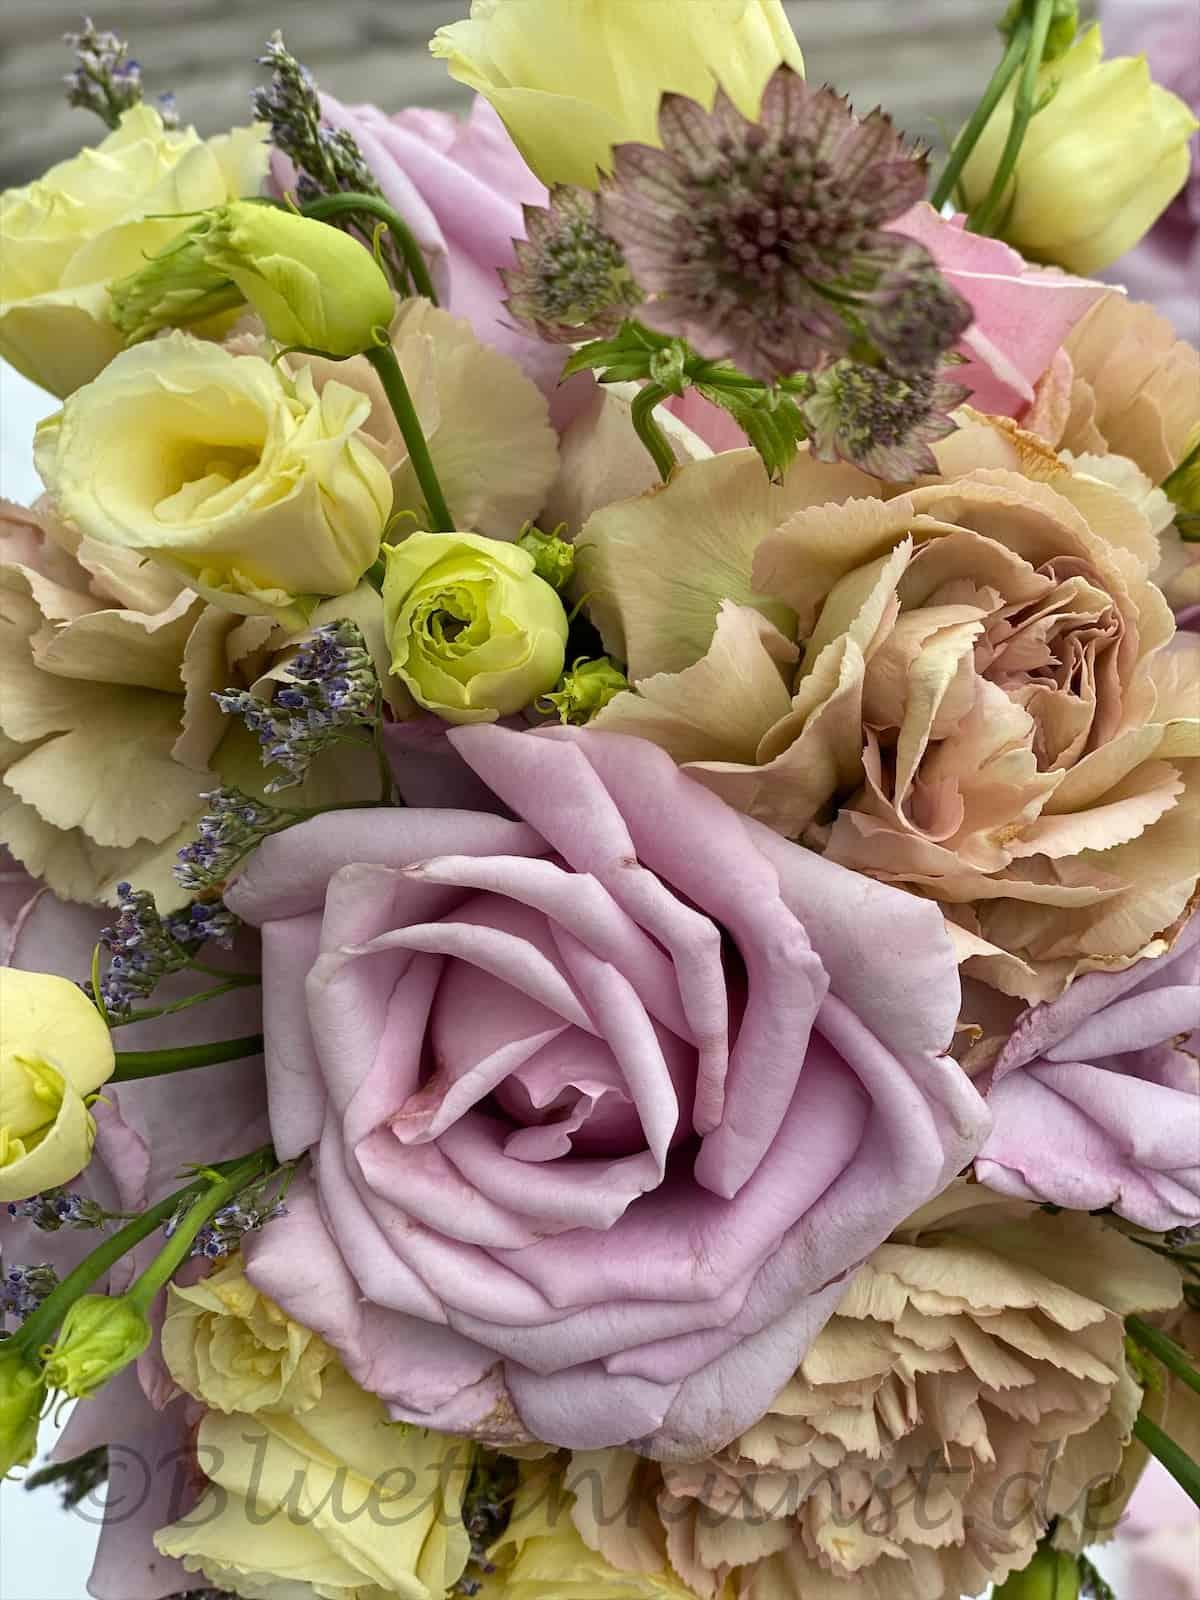 Blütentraum in rosa nudefarbene Nelke mit cremefarbenem Lisianthus, rosa Rosen, rosa Astrantia Sterndolde